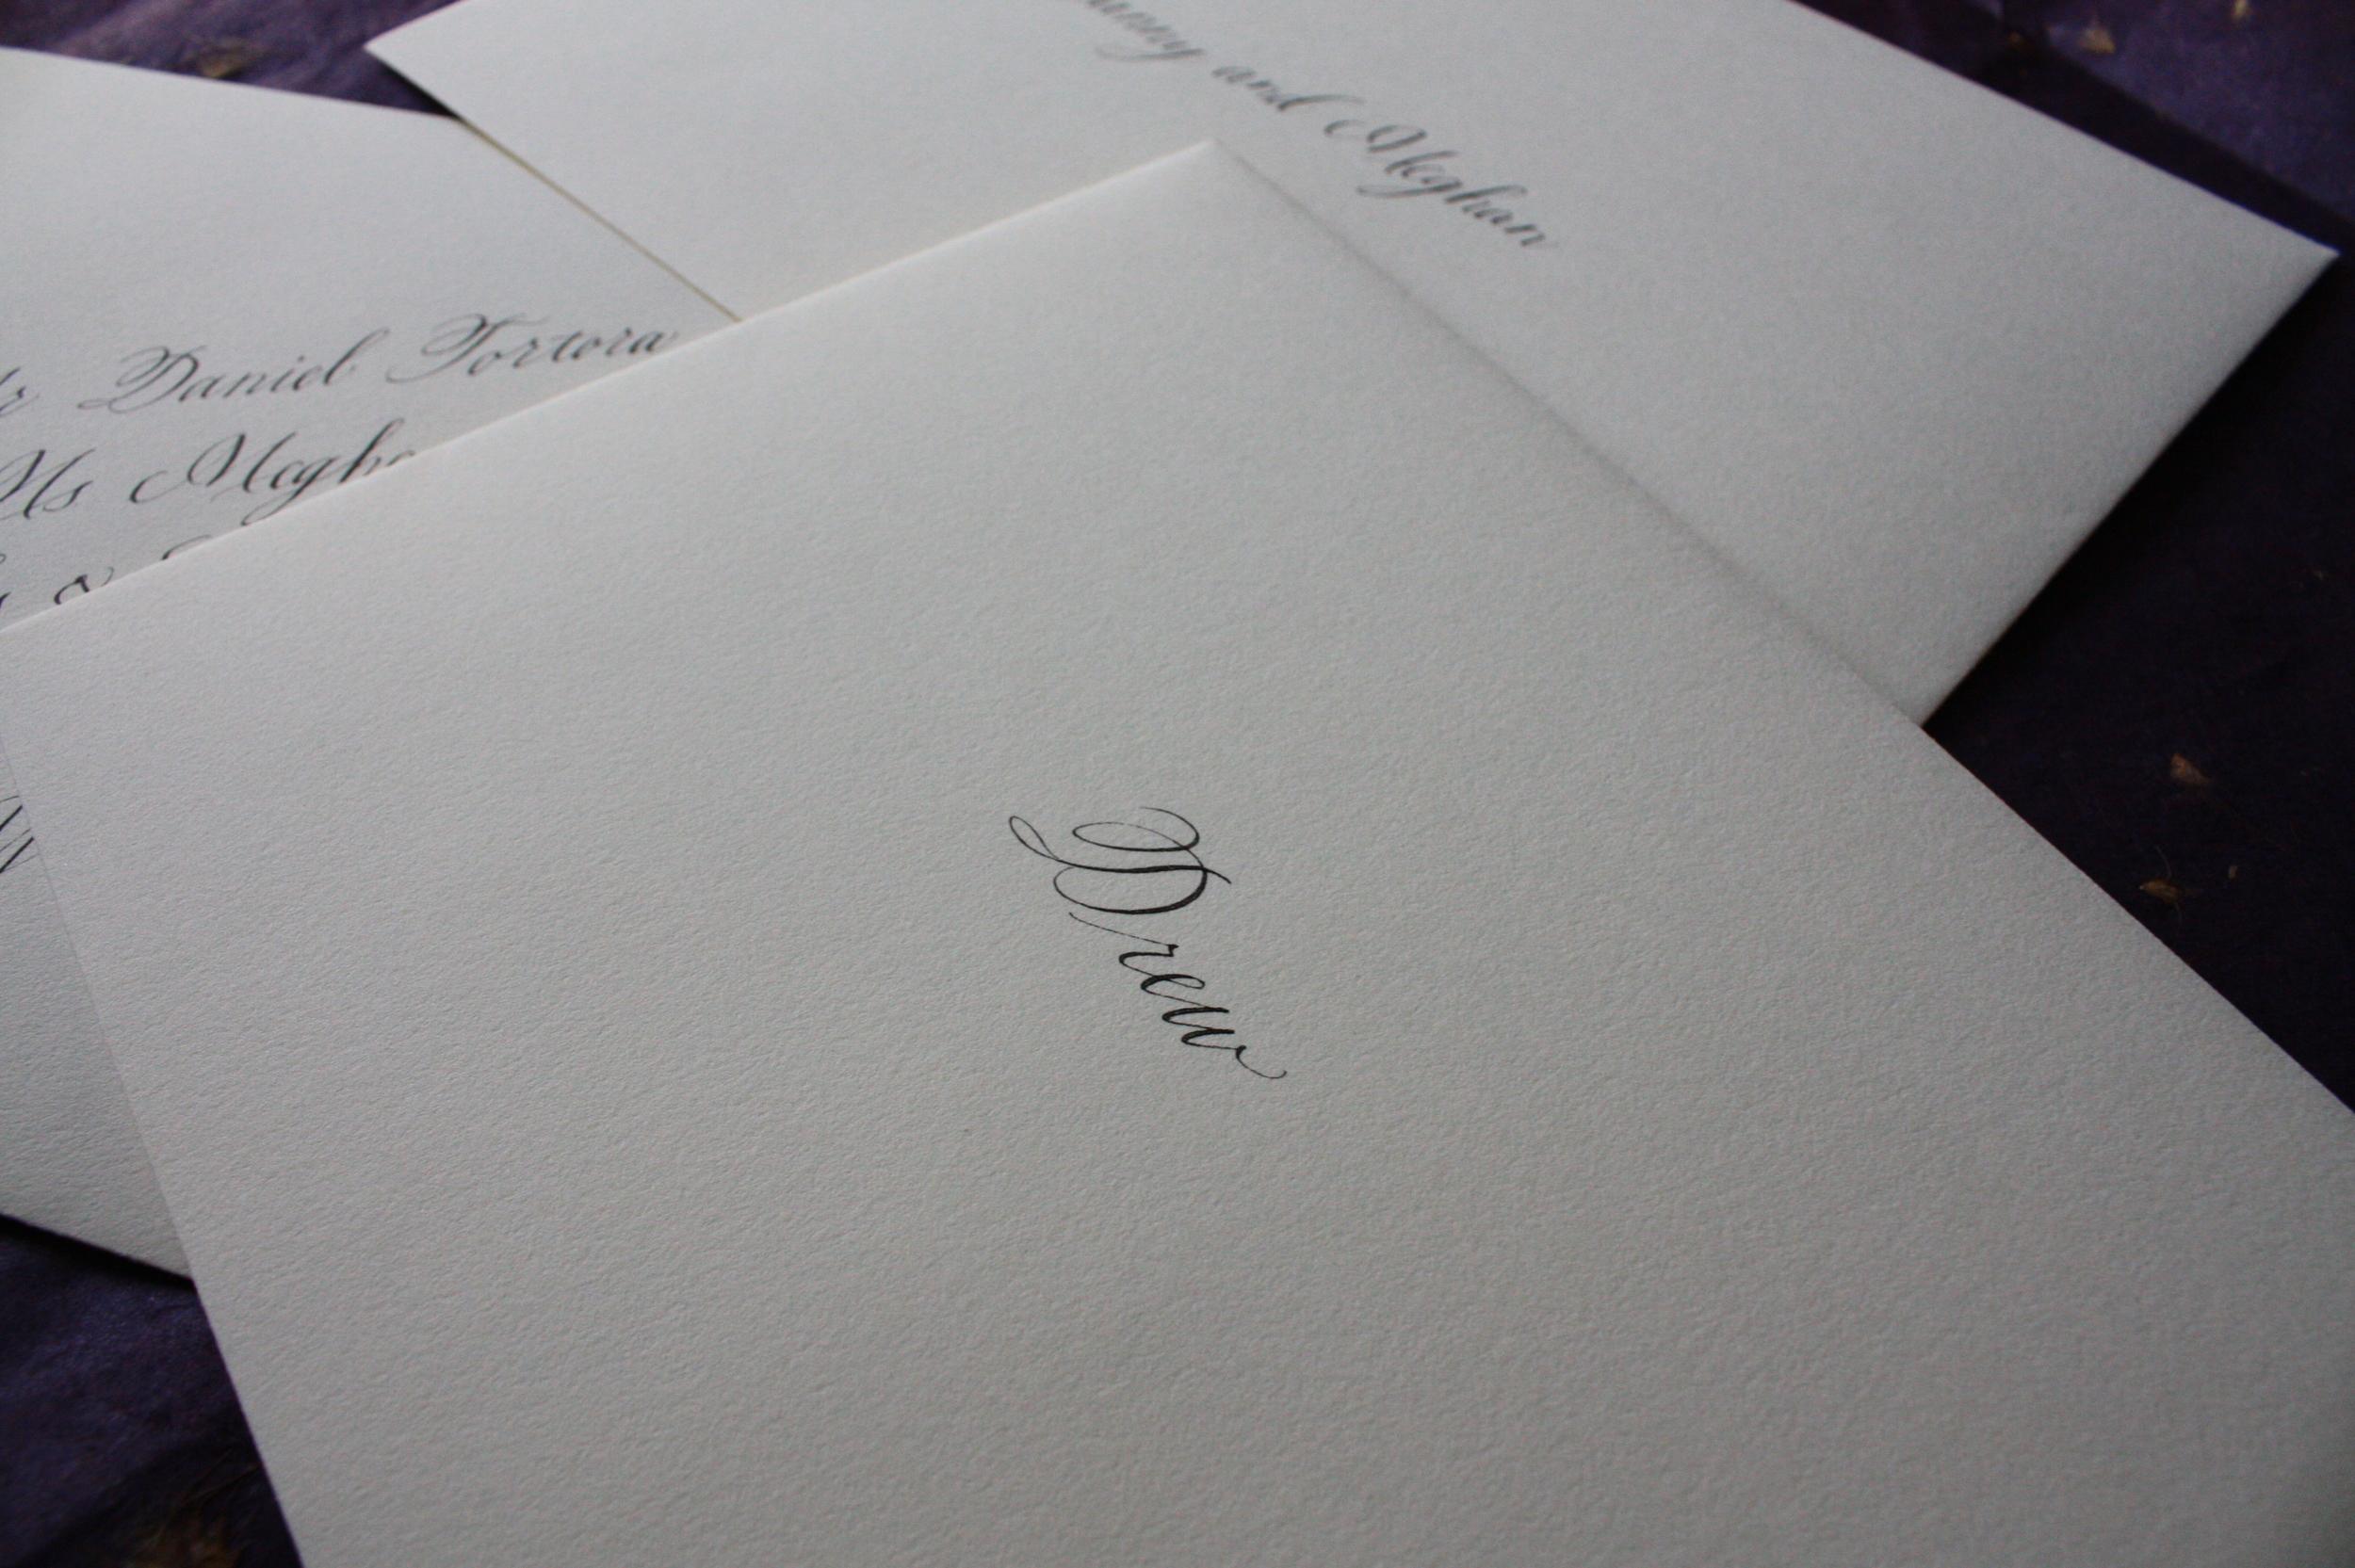 Bloom / Bluestocking Calligraphy